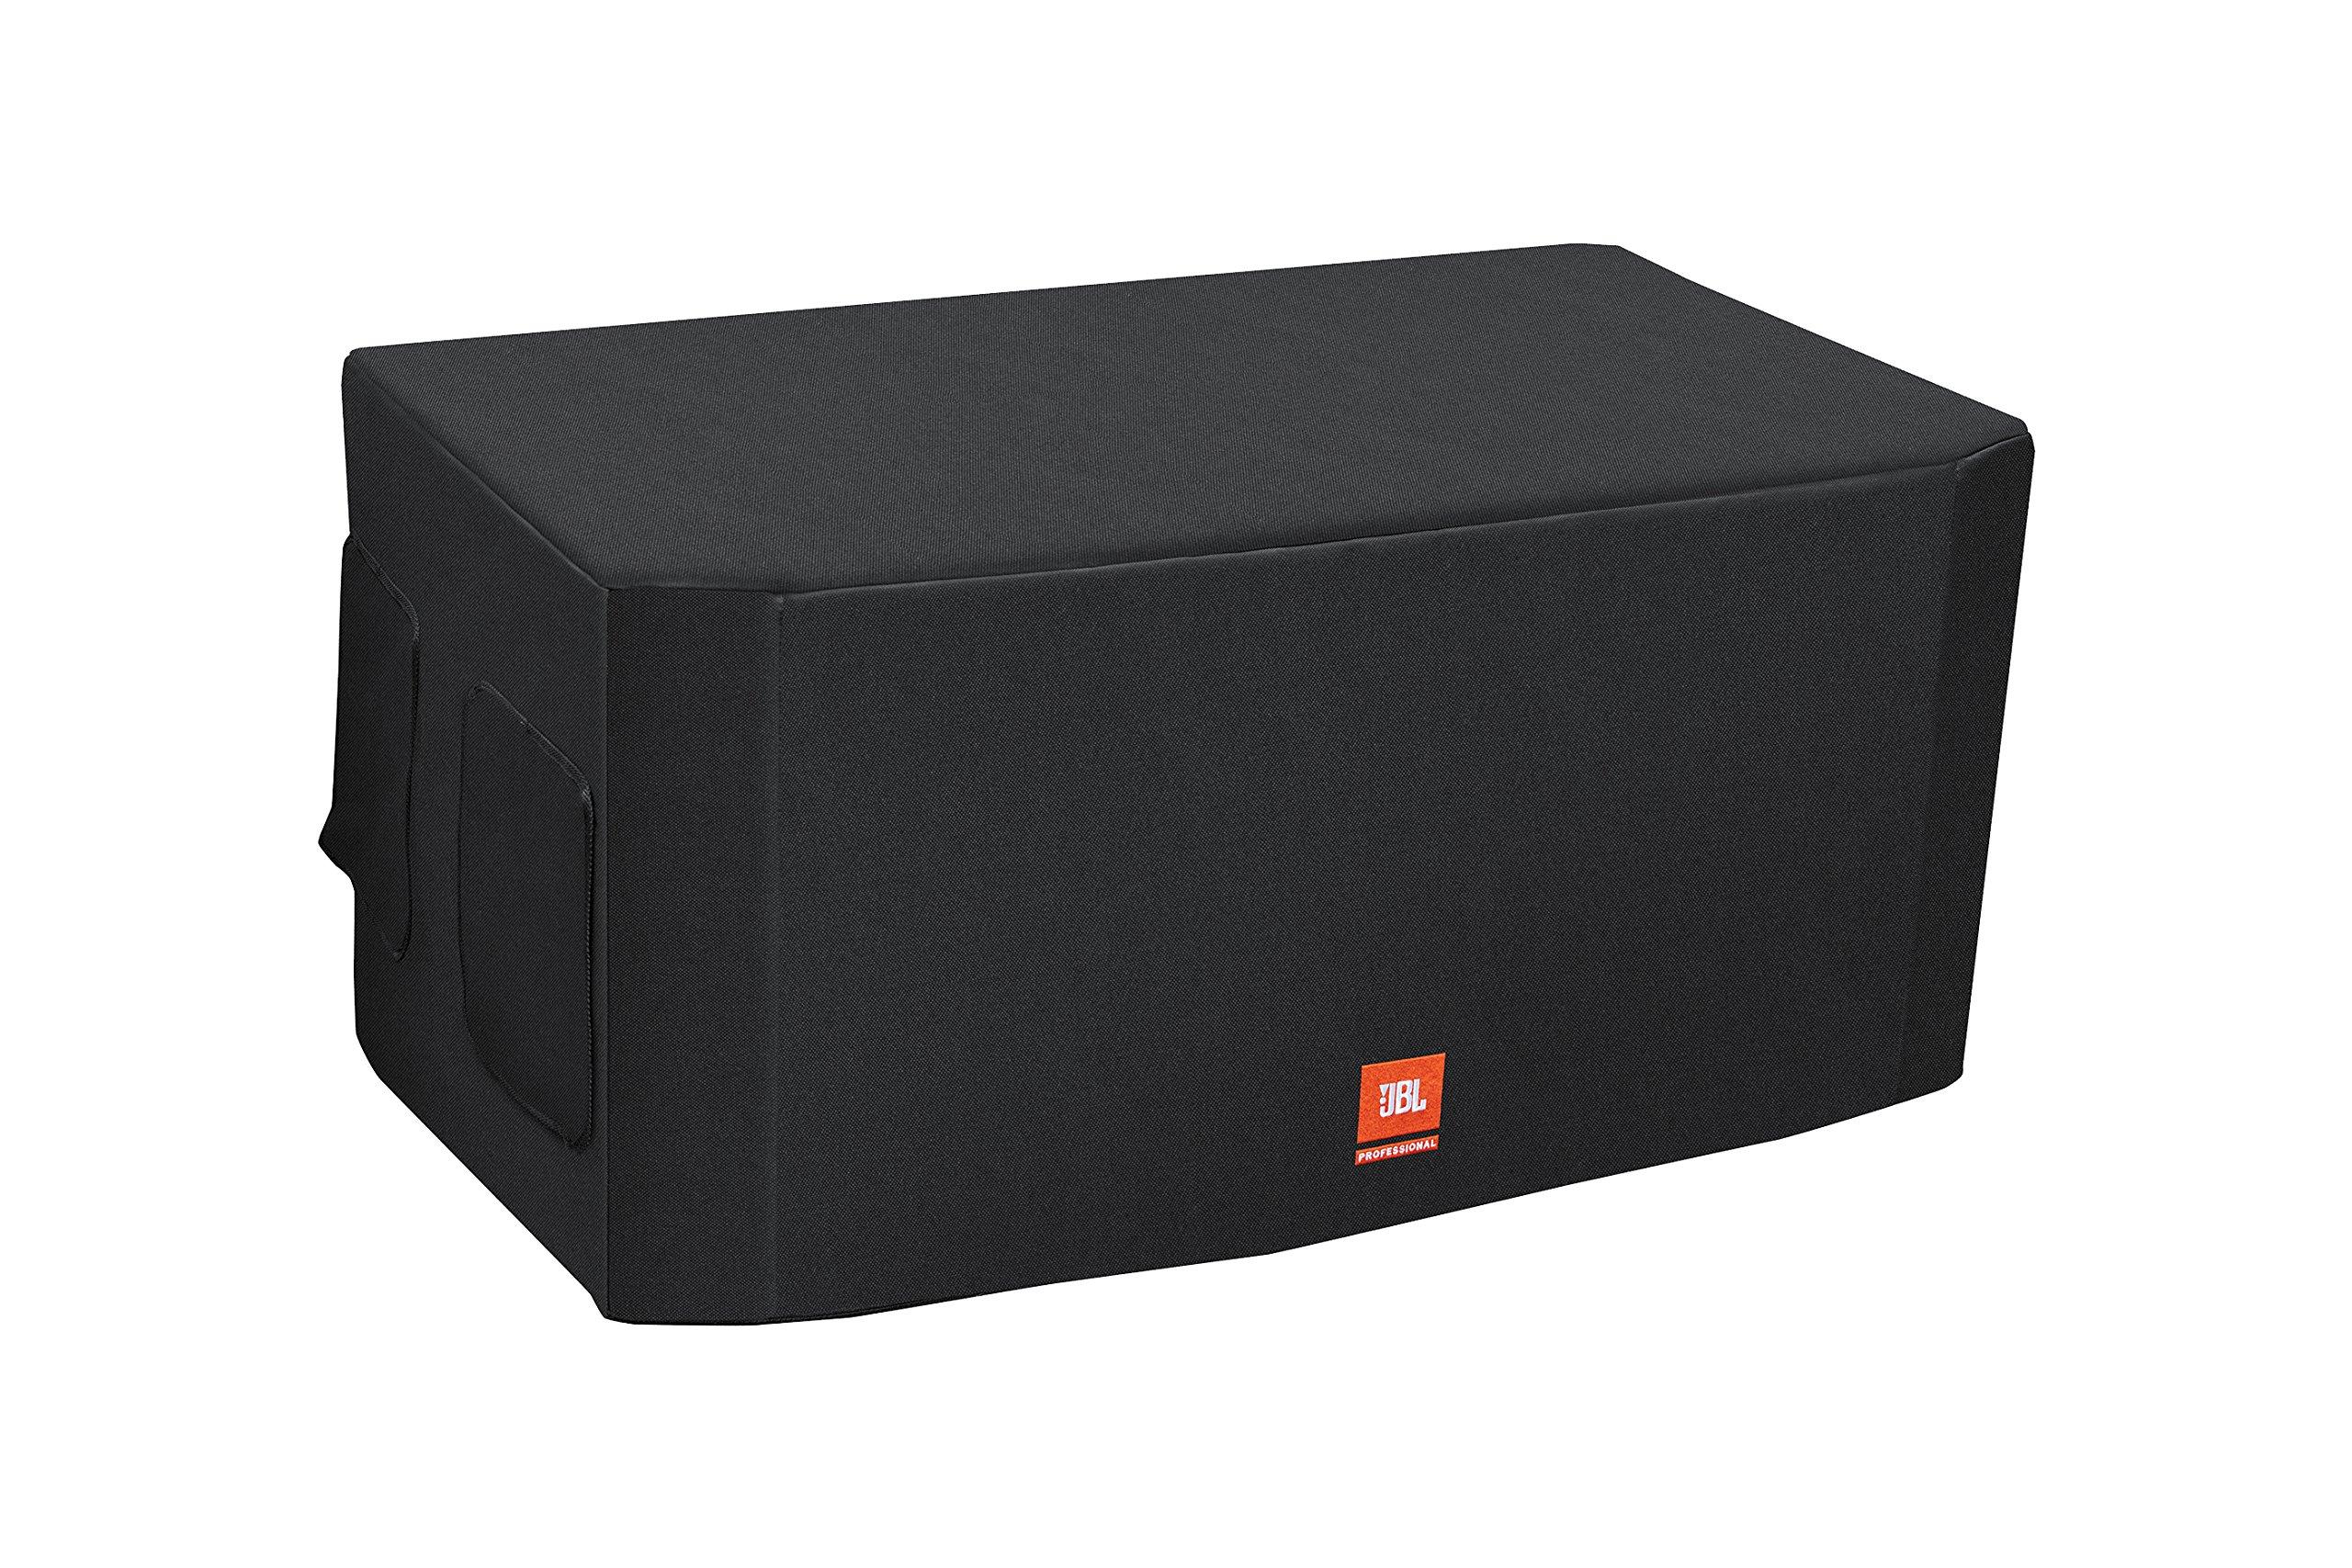 JBL Bags SRX828SP-CVR-DLX Deluxe Padded Protective Cover for SRX828SP-CVR